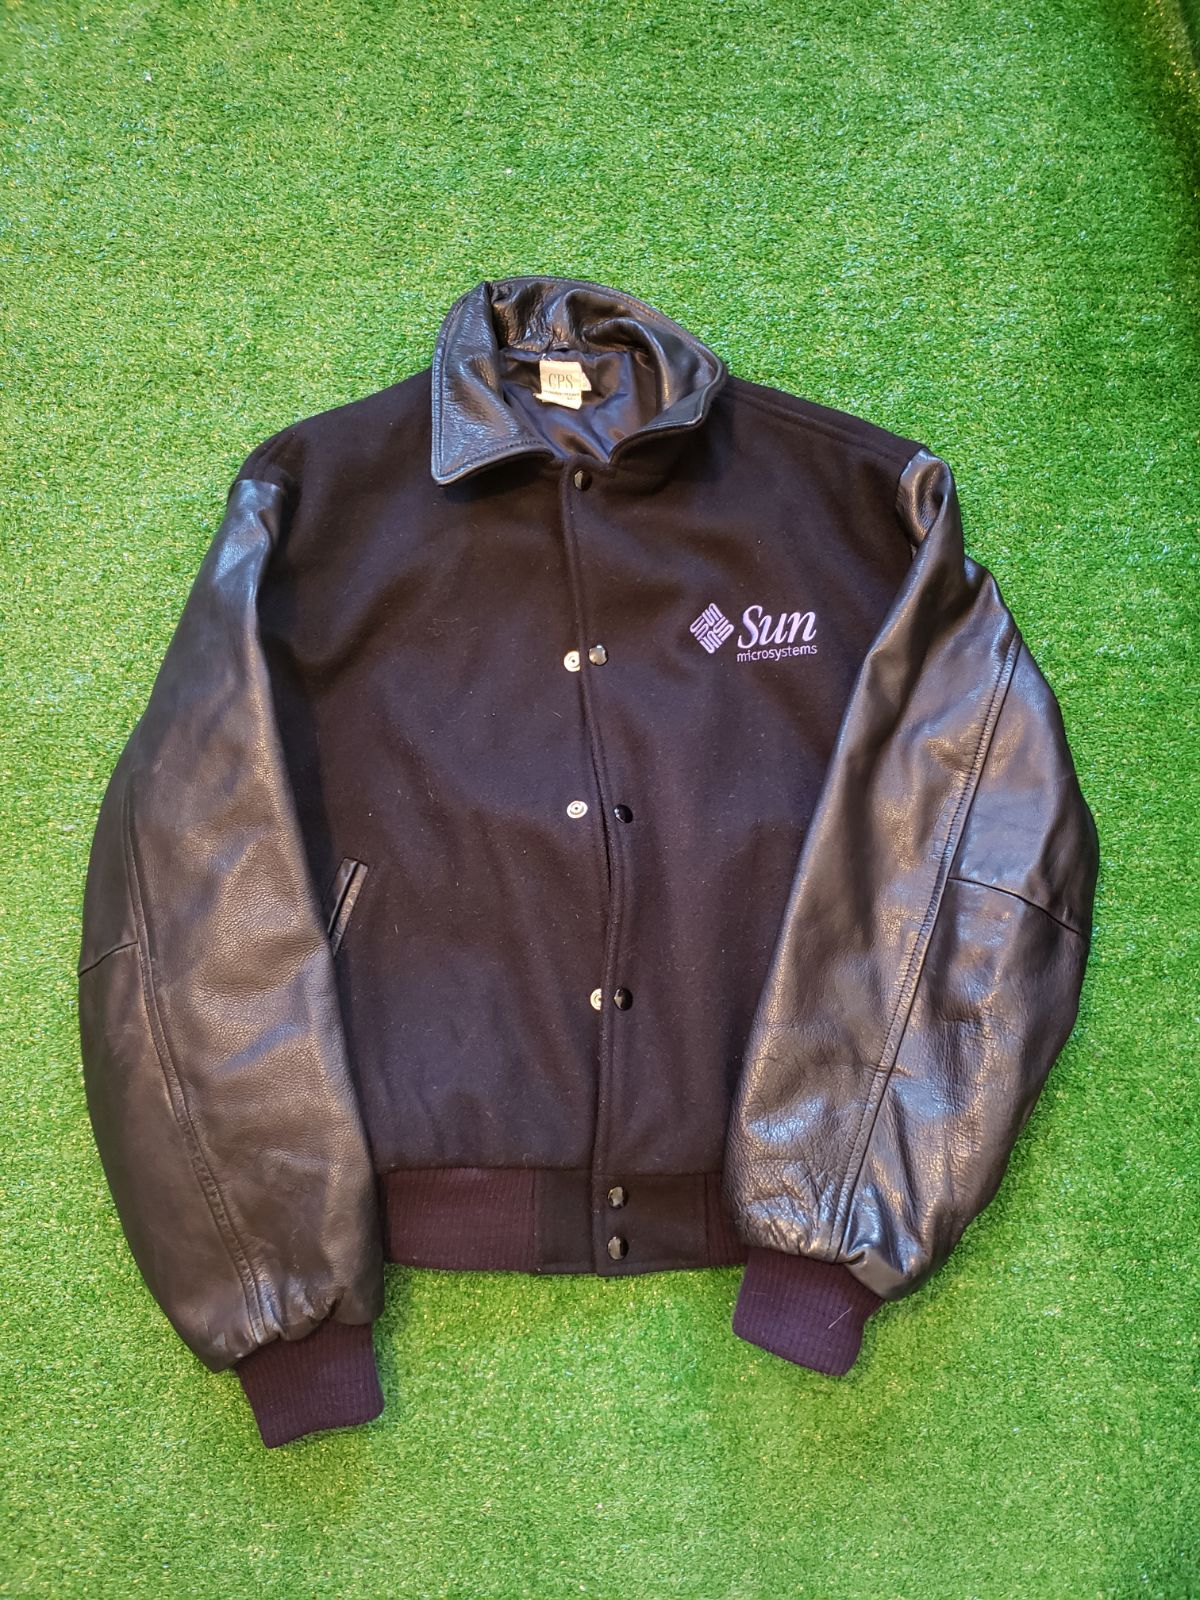 Vintage Java Sun Jacket XL